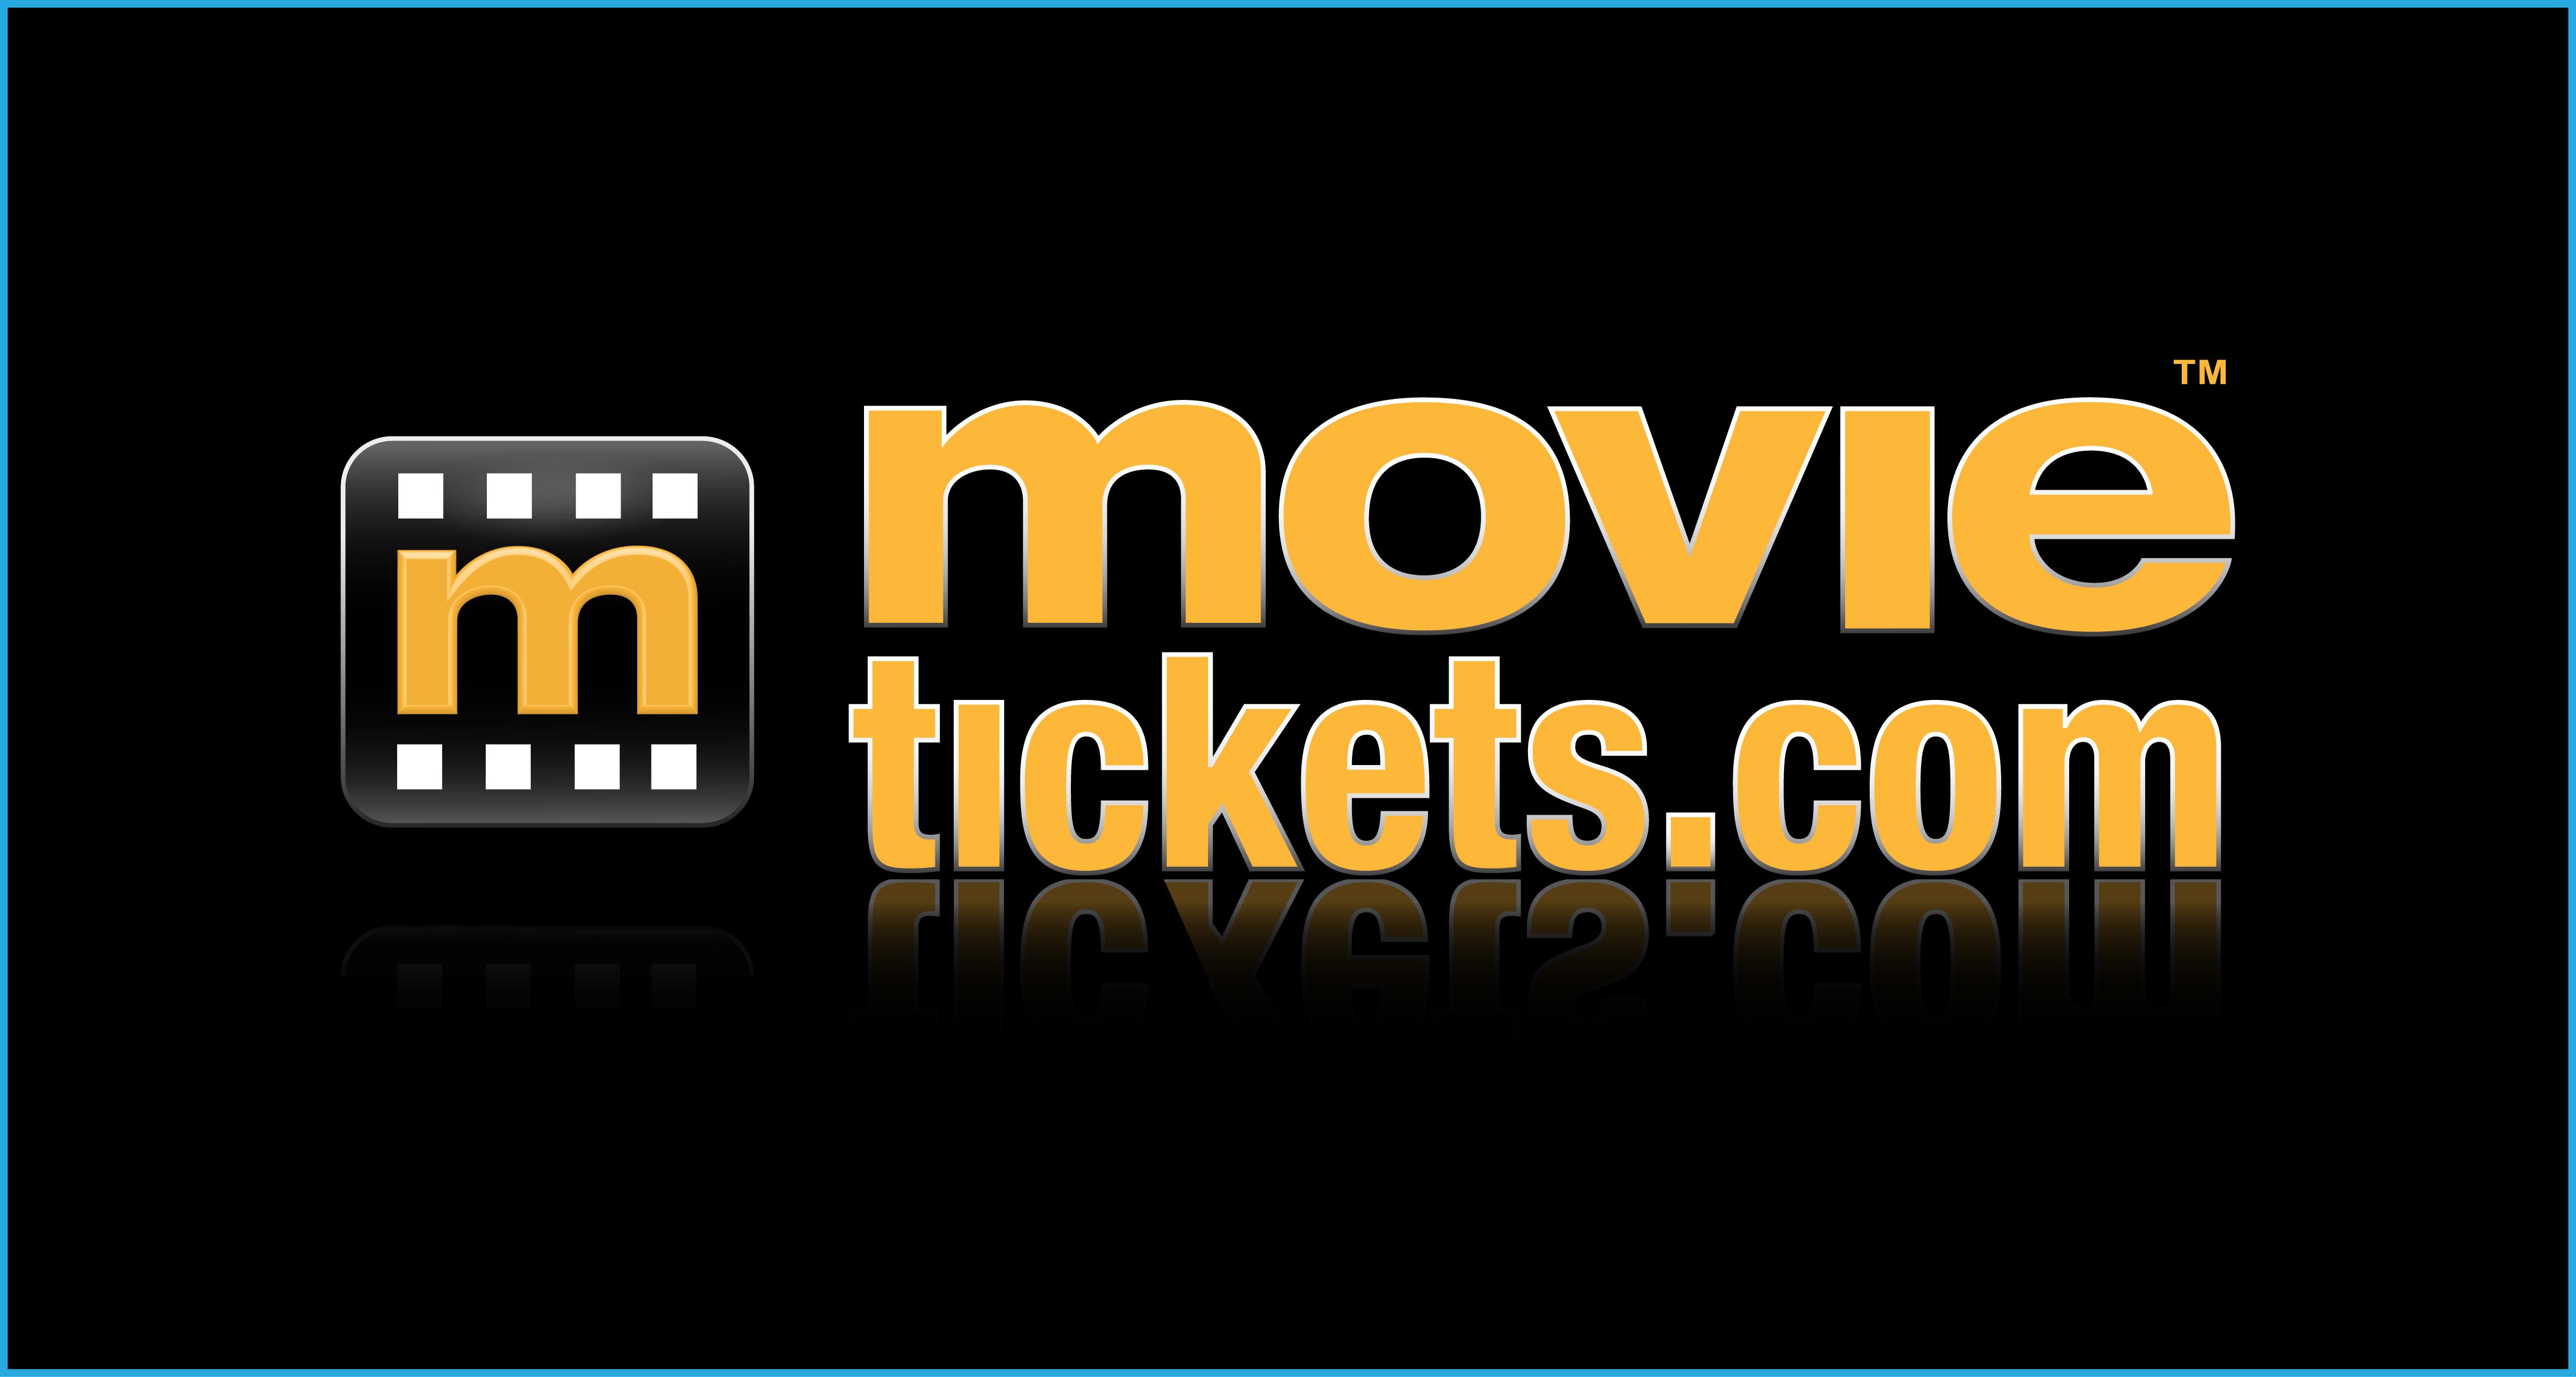 movietickets logo